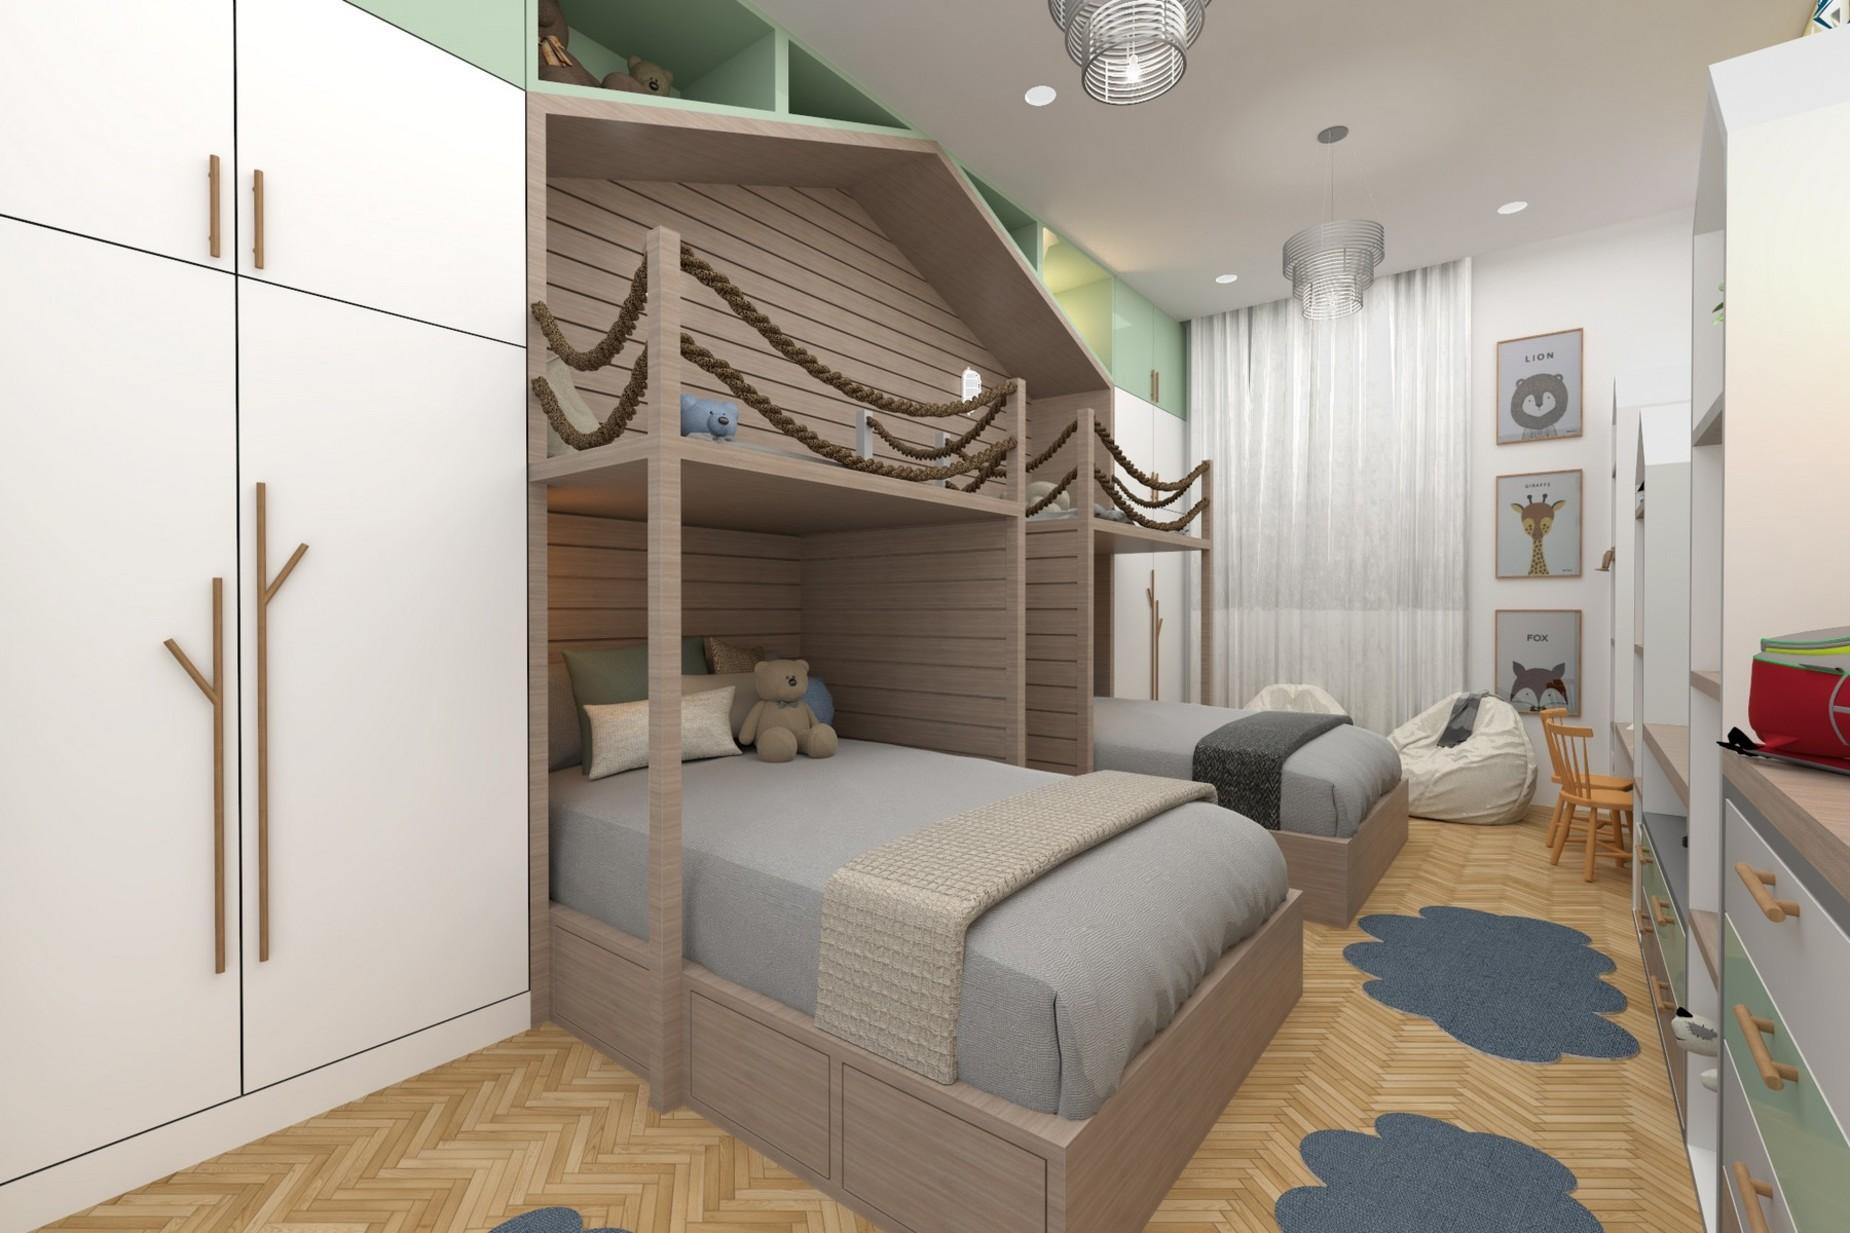 4 bed Villa For Sale in Mellieha, Mellieha - thumb 17